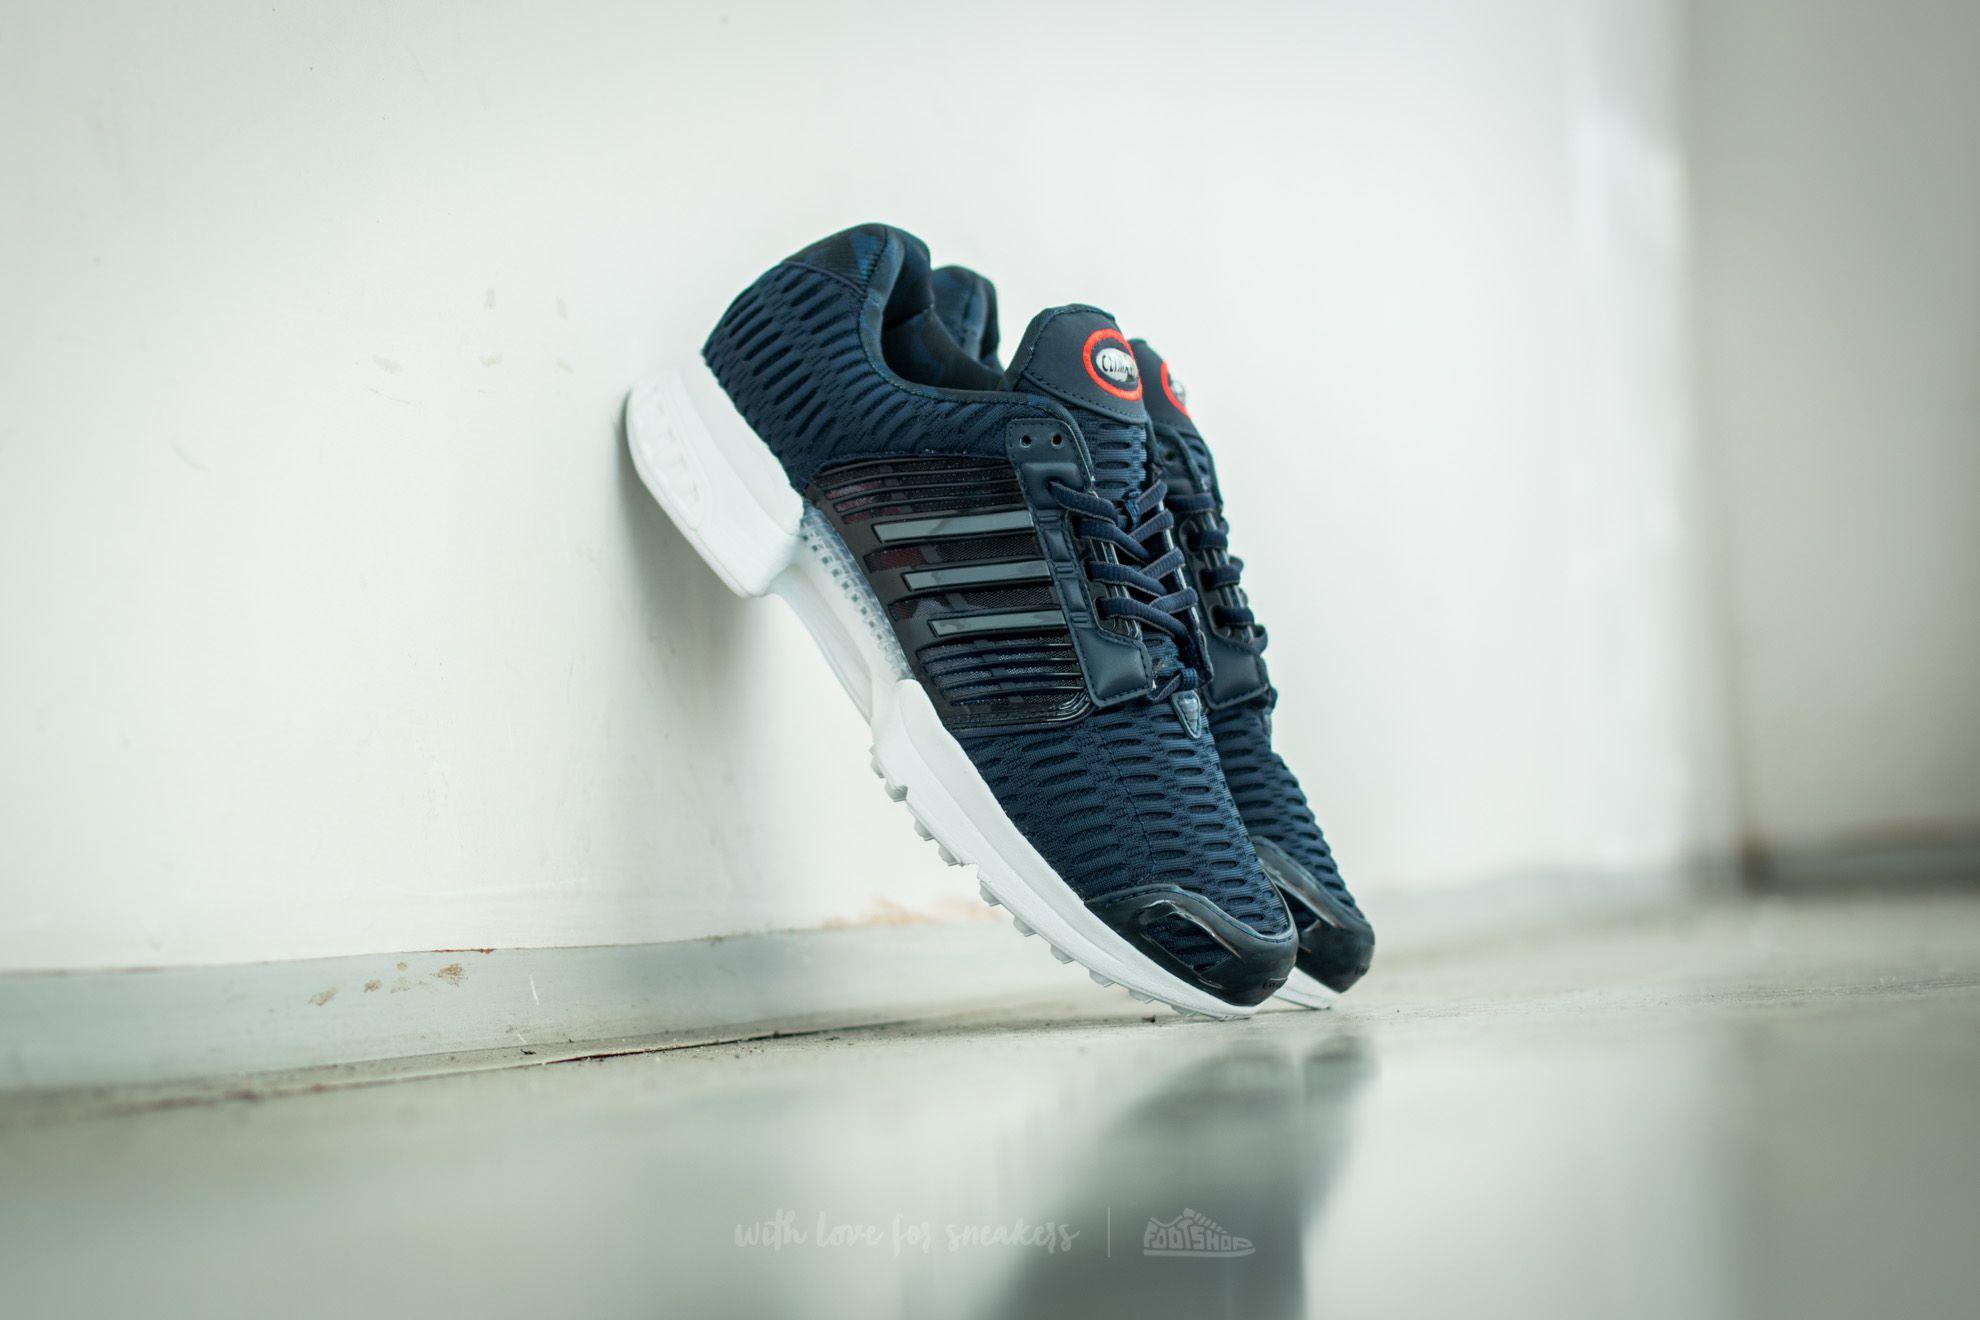 adidas Climacool 1 Collegiate Navy/ Utility Blue/ Footwear White - 14579